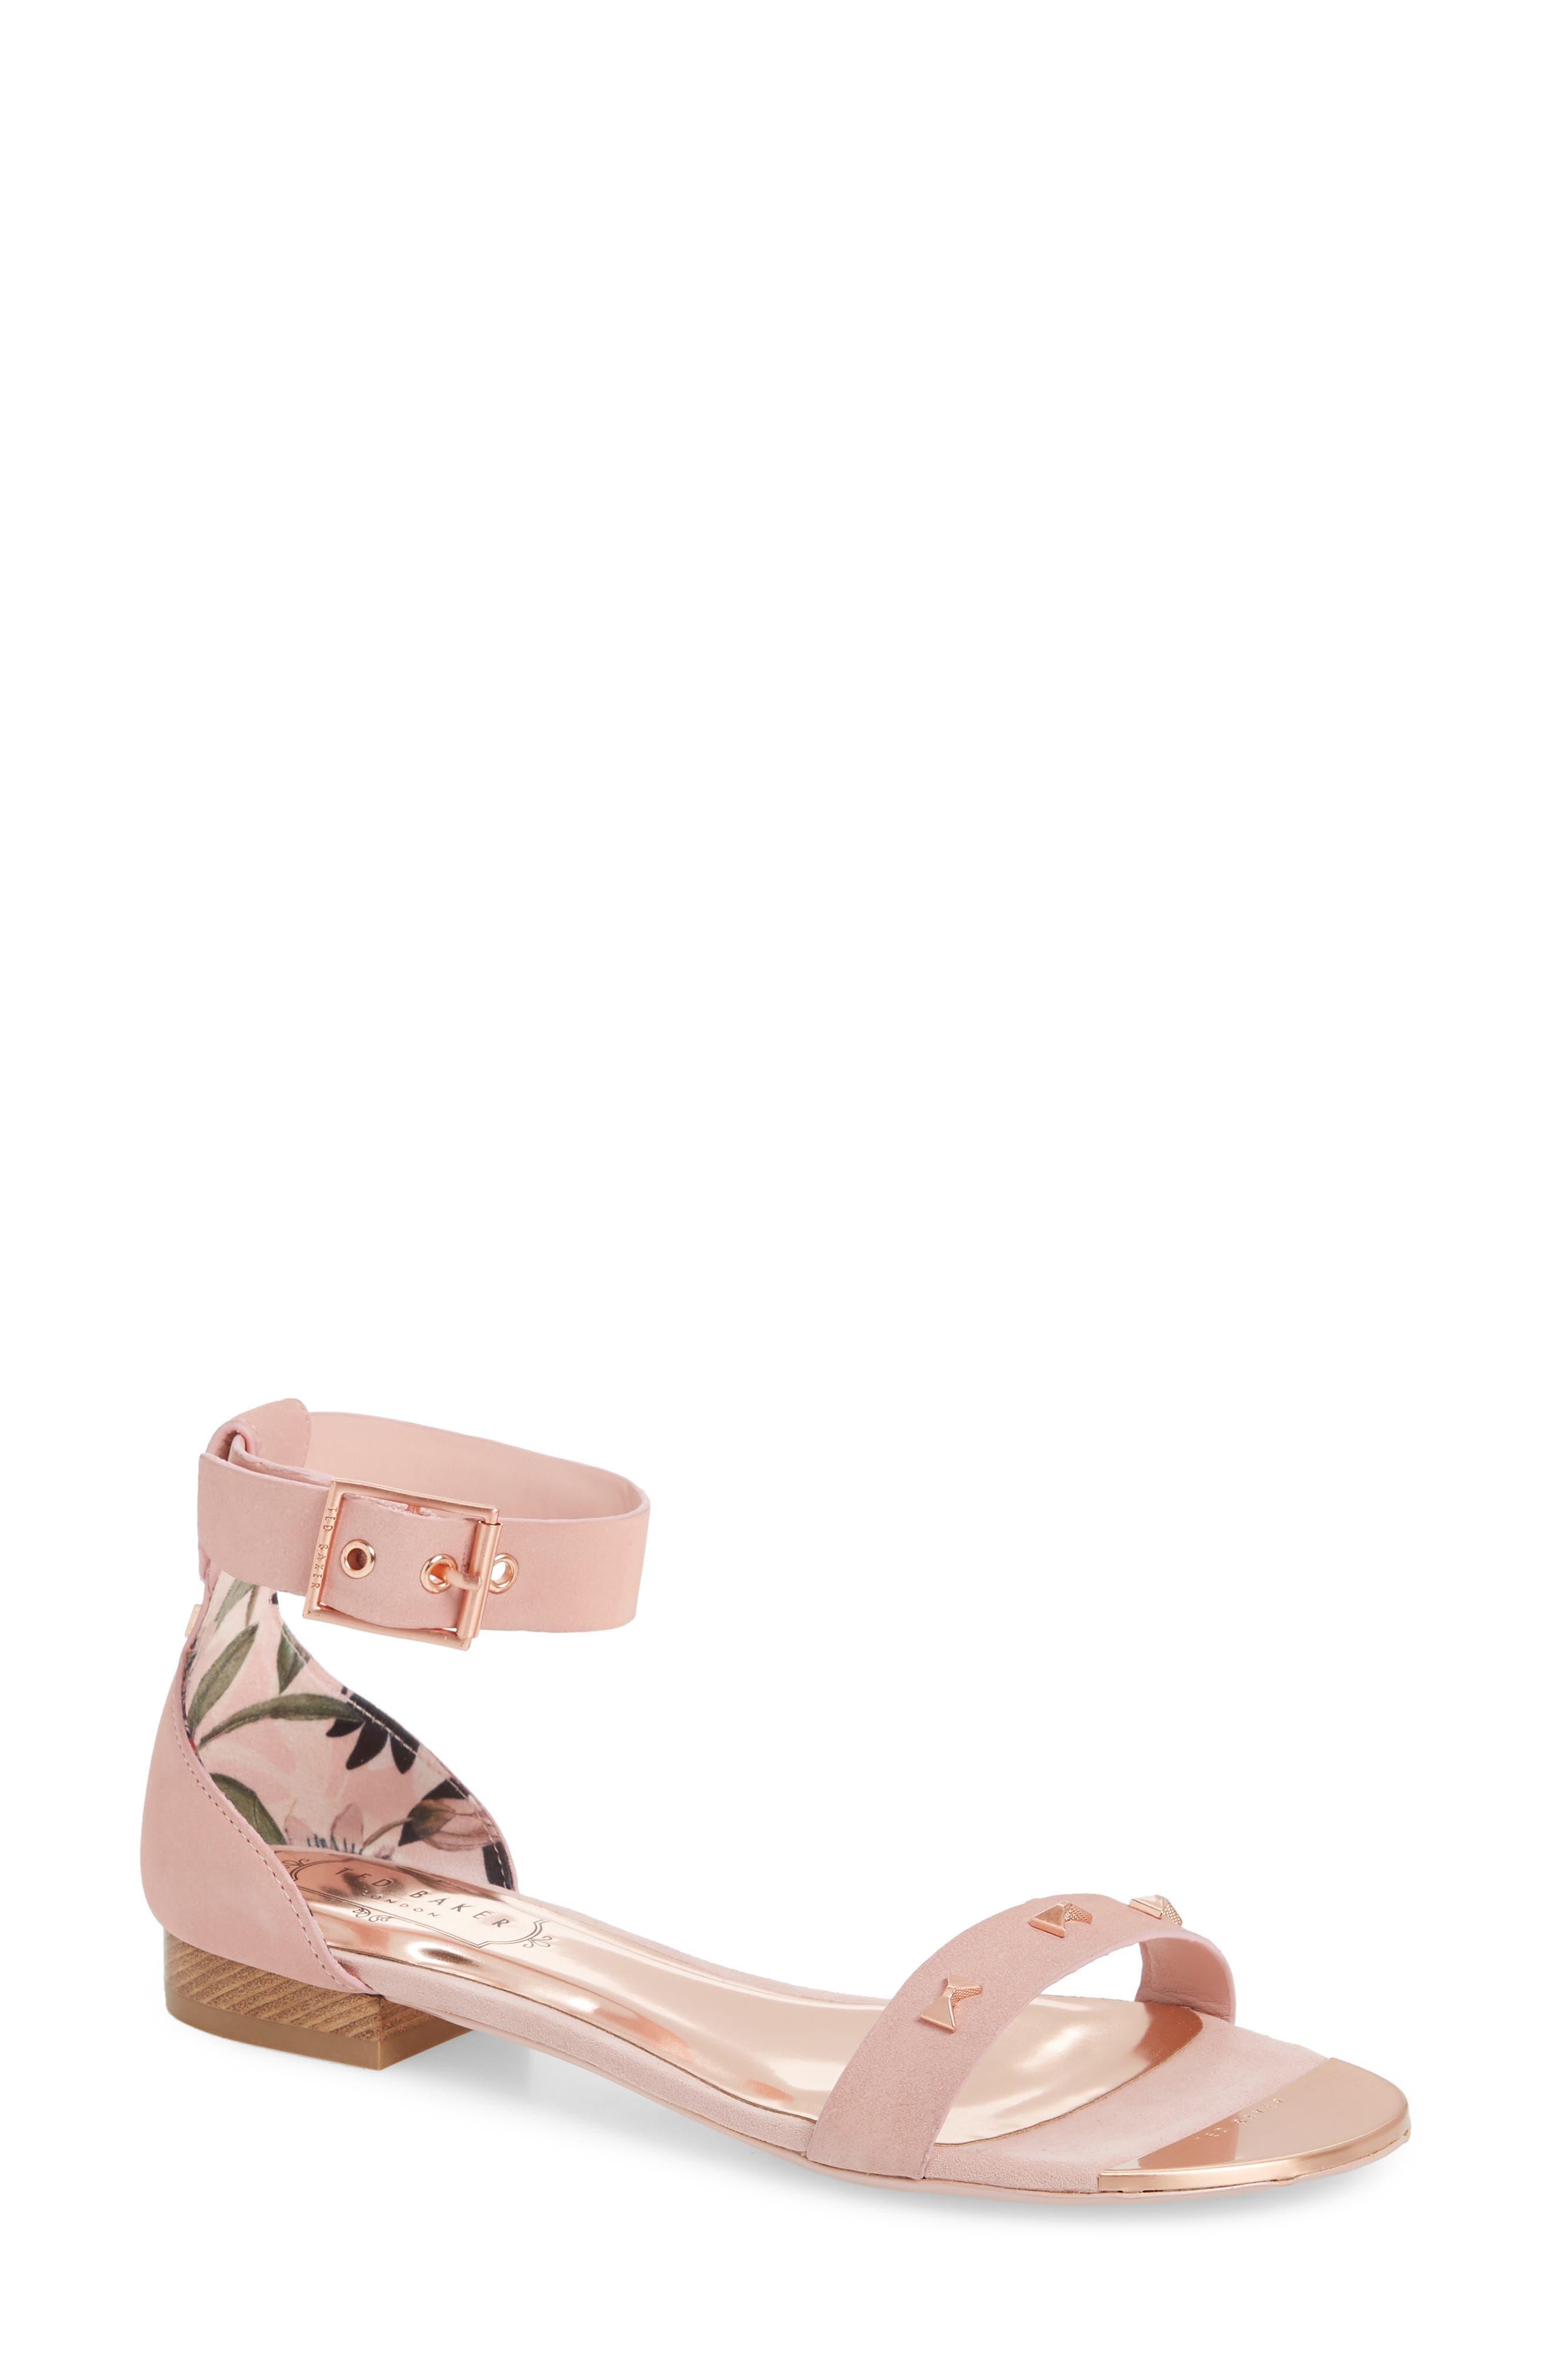 Ted Baker London Ovey Sandal - Pink